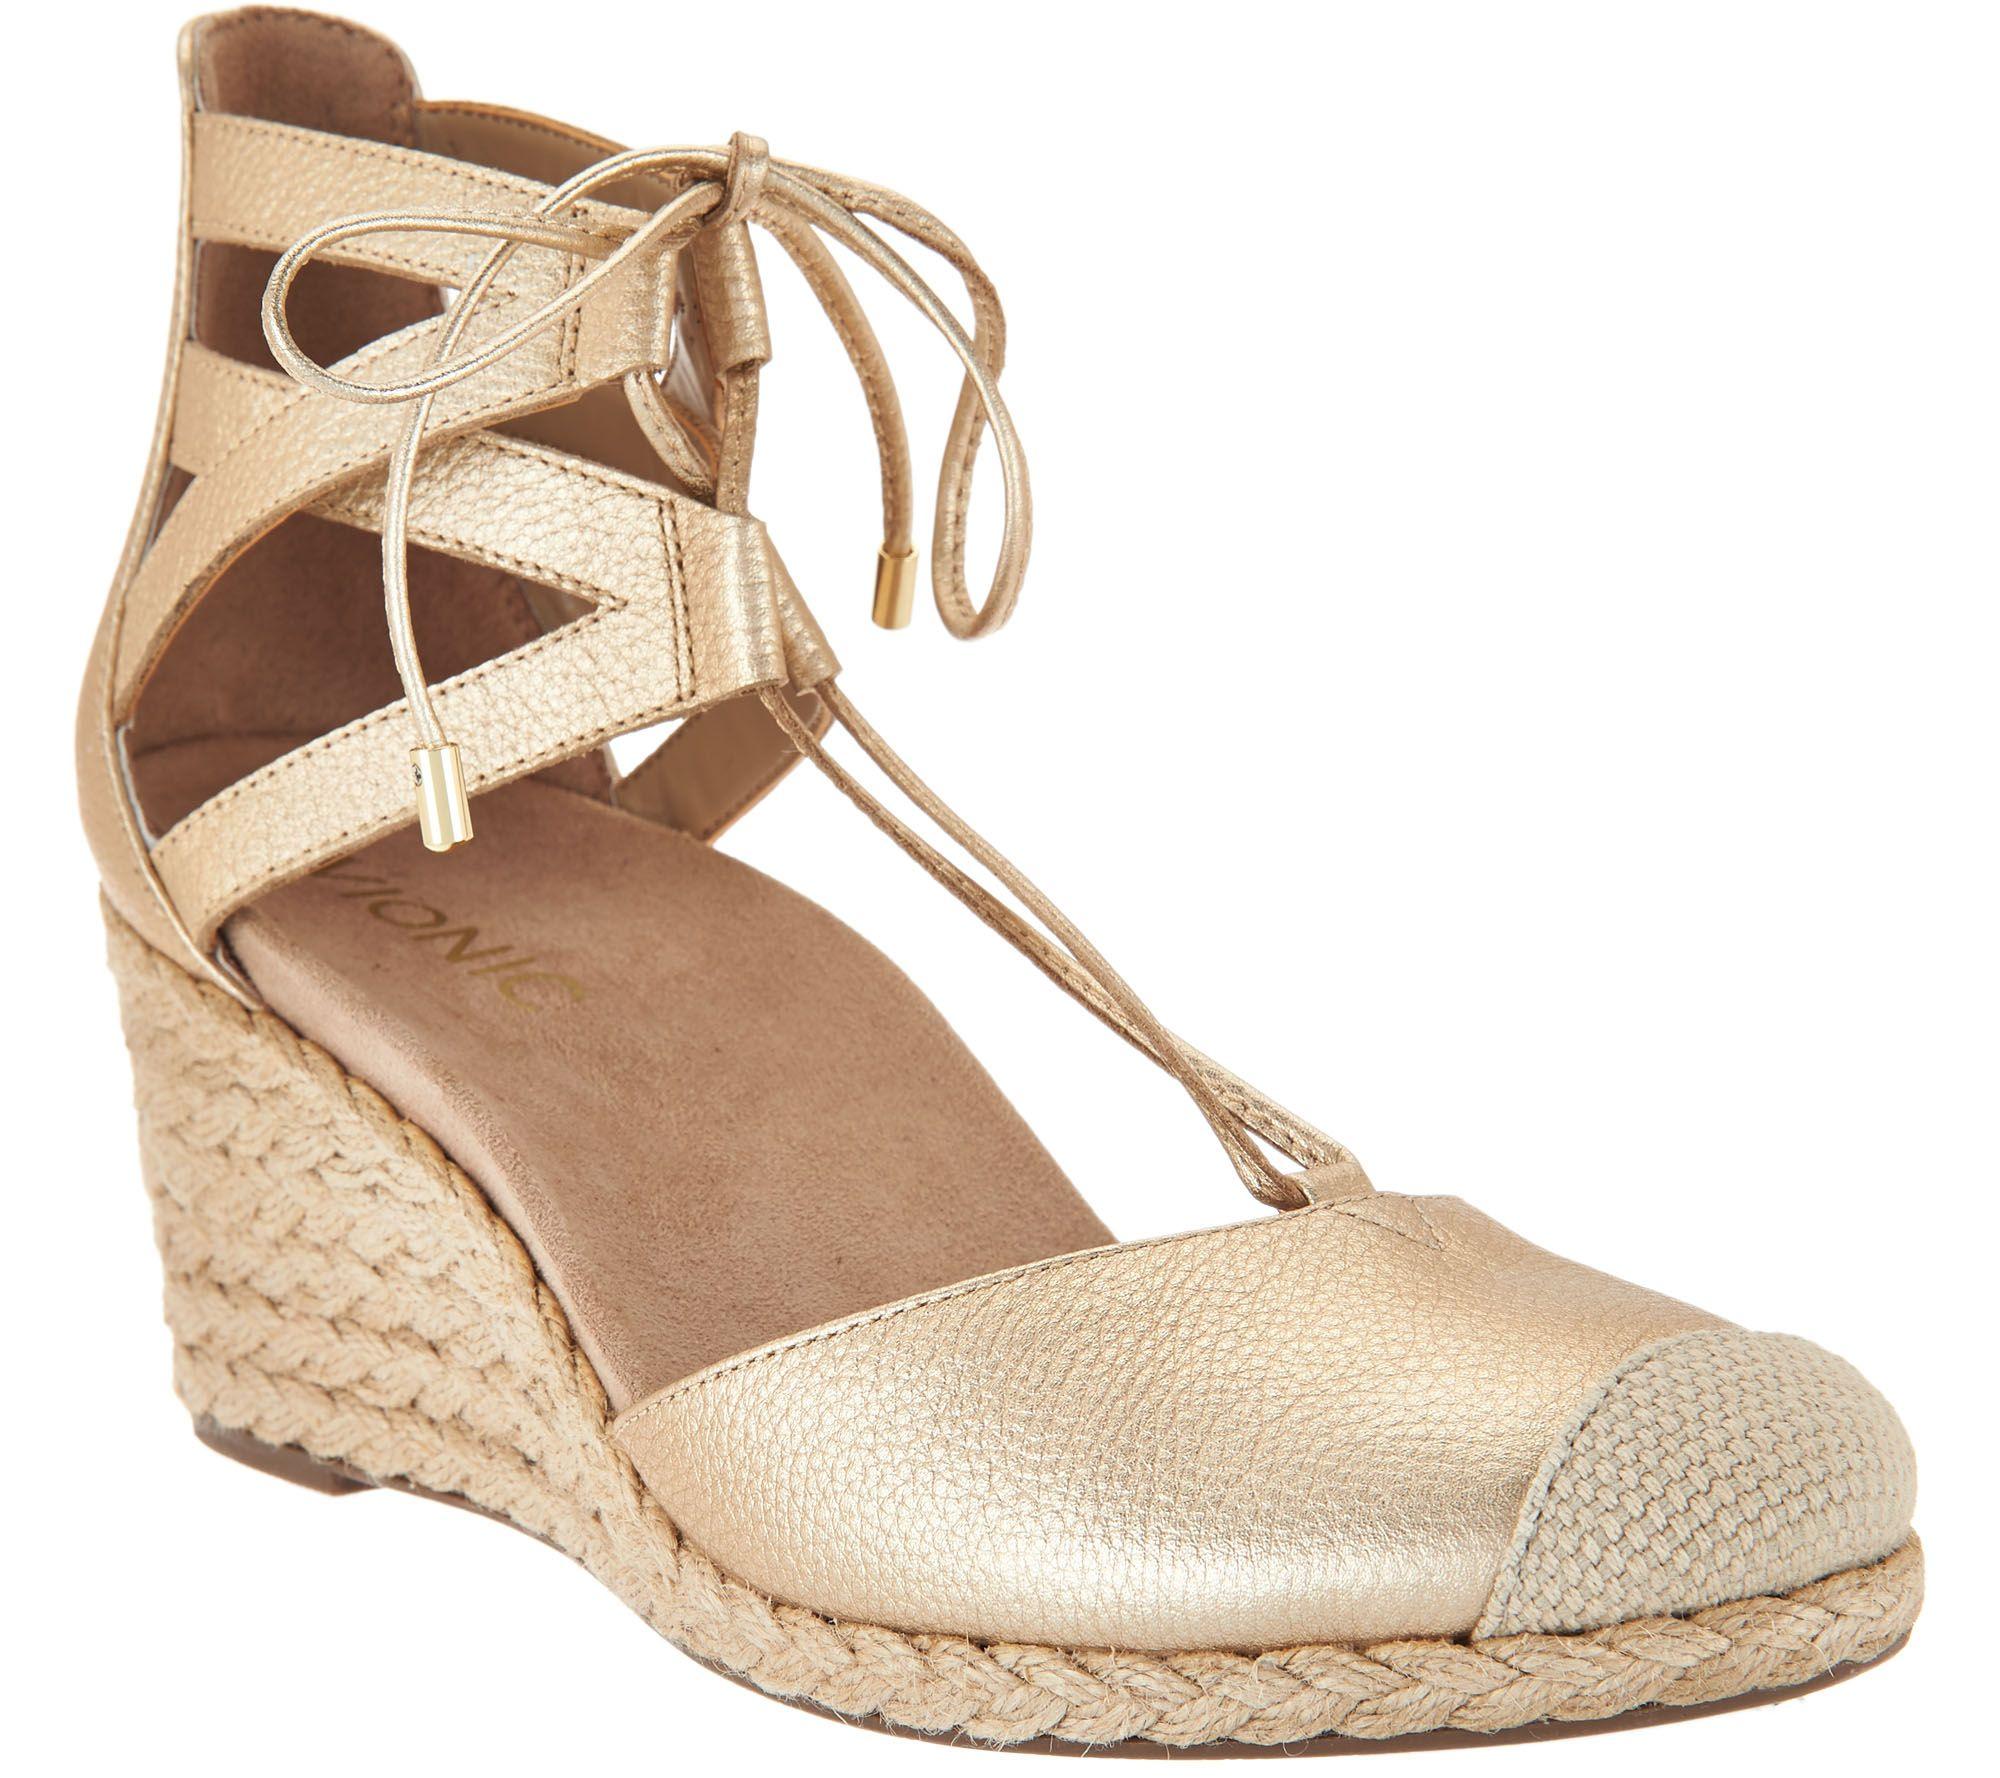 Vionic Maris Ankle Lace Up Wedge Espadrilles p5jA8O1